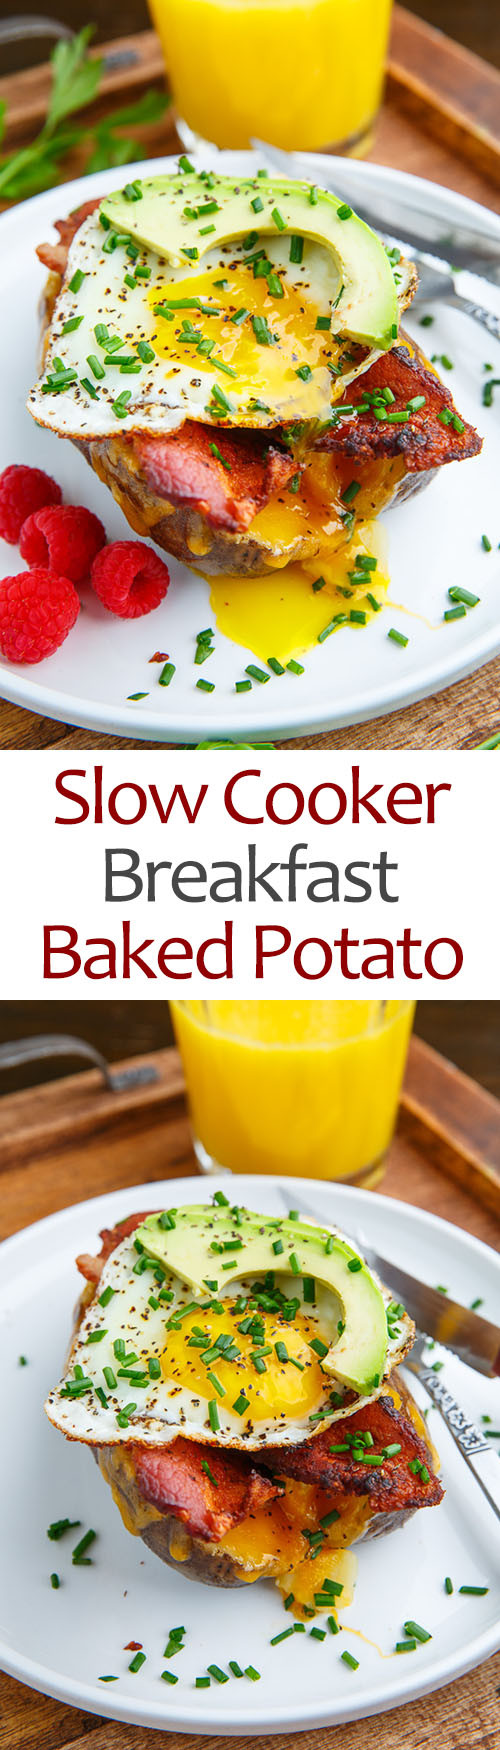 Slow Cooker Breakfast Potatoes  Slow Cooker Breakfast Baked Potatoes Recipe on Closet Cooking